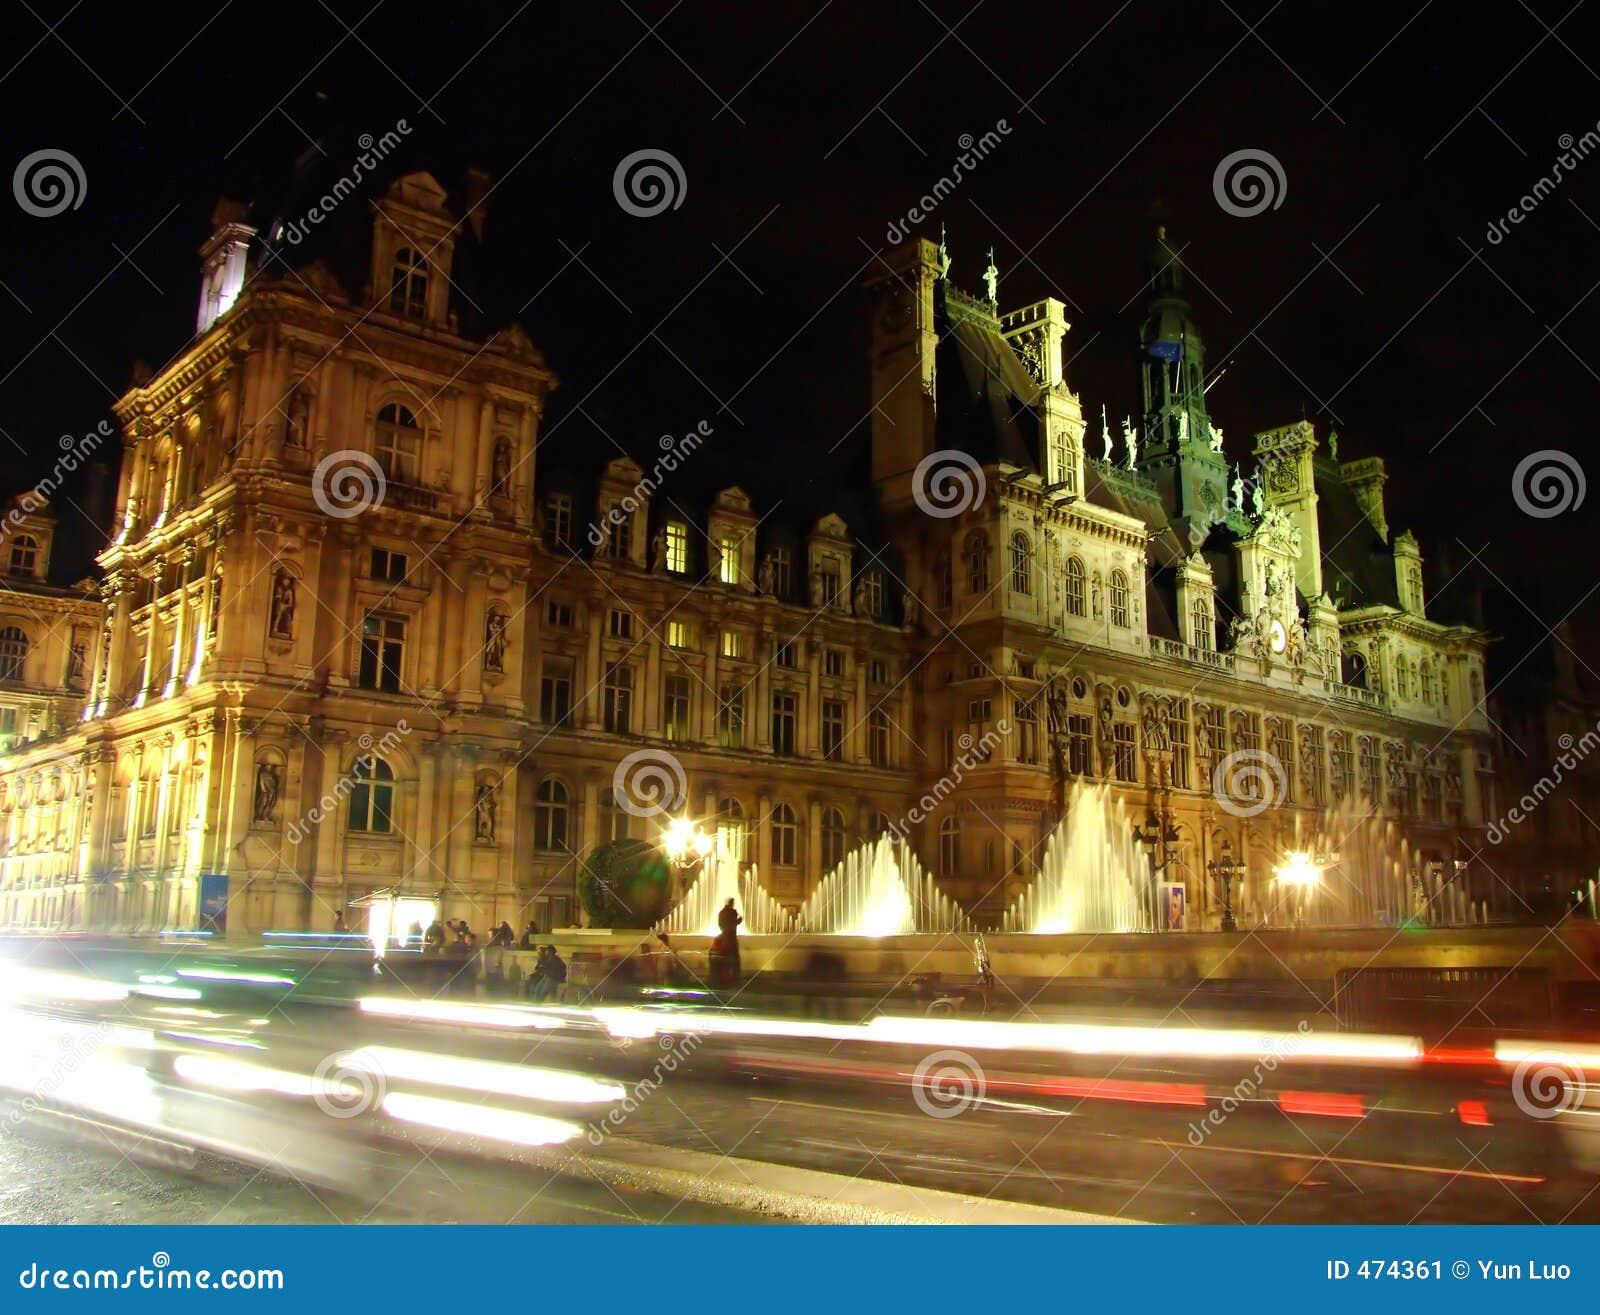 Download Hotel De Ville De Paris (city Hall) Stock Image - Image of street, blanche: 474361